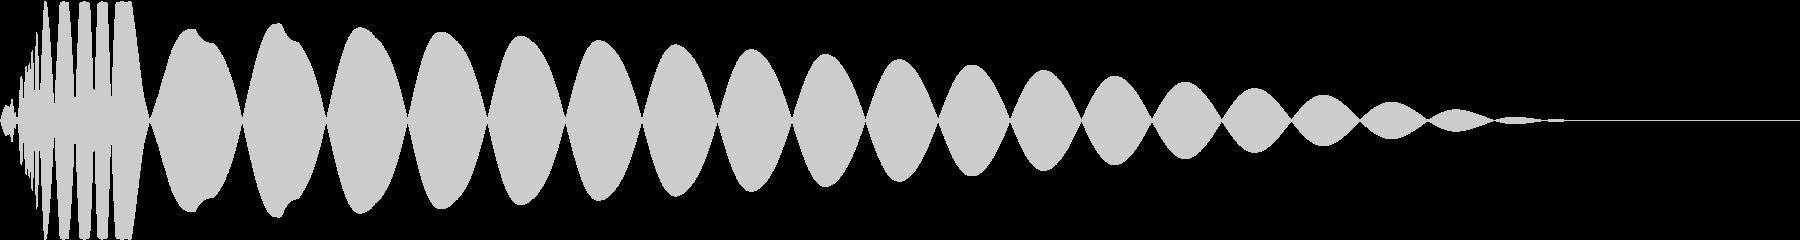 DTM Kick 43 オリジナル音源の未再生の波形